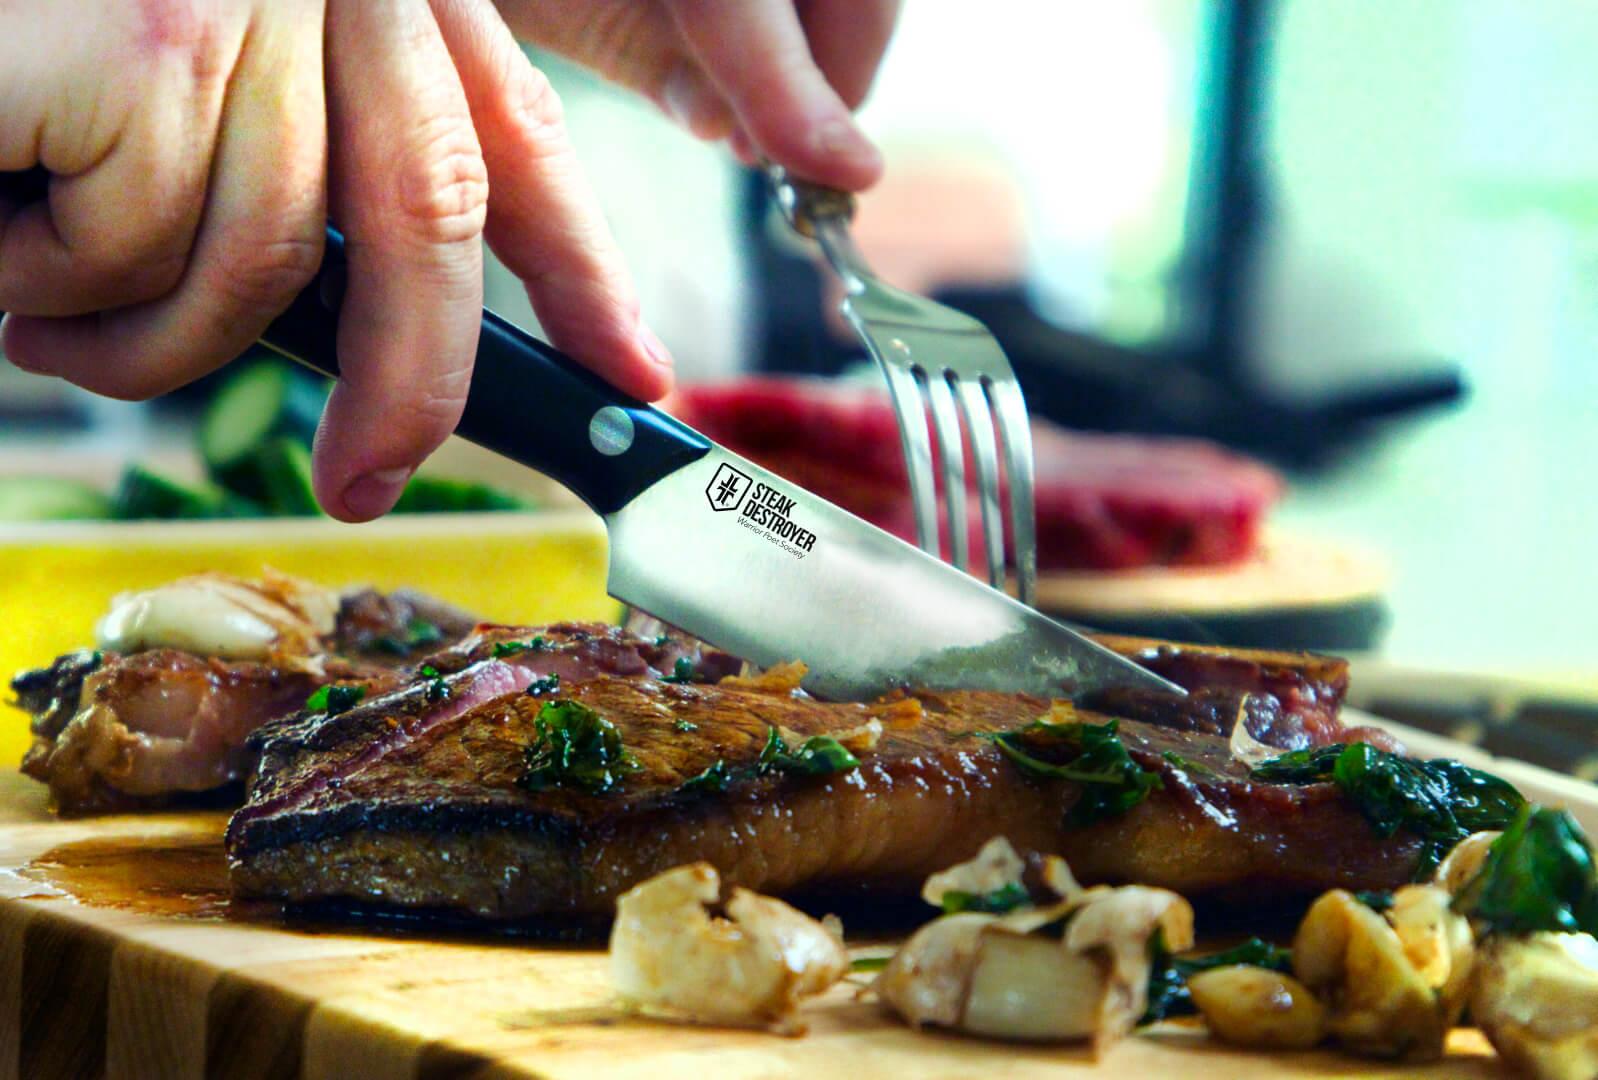 steak-destroyer-cut-blog.jpg